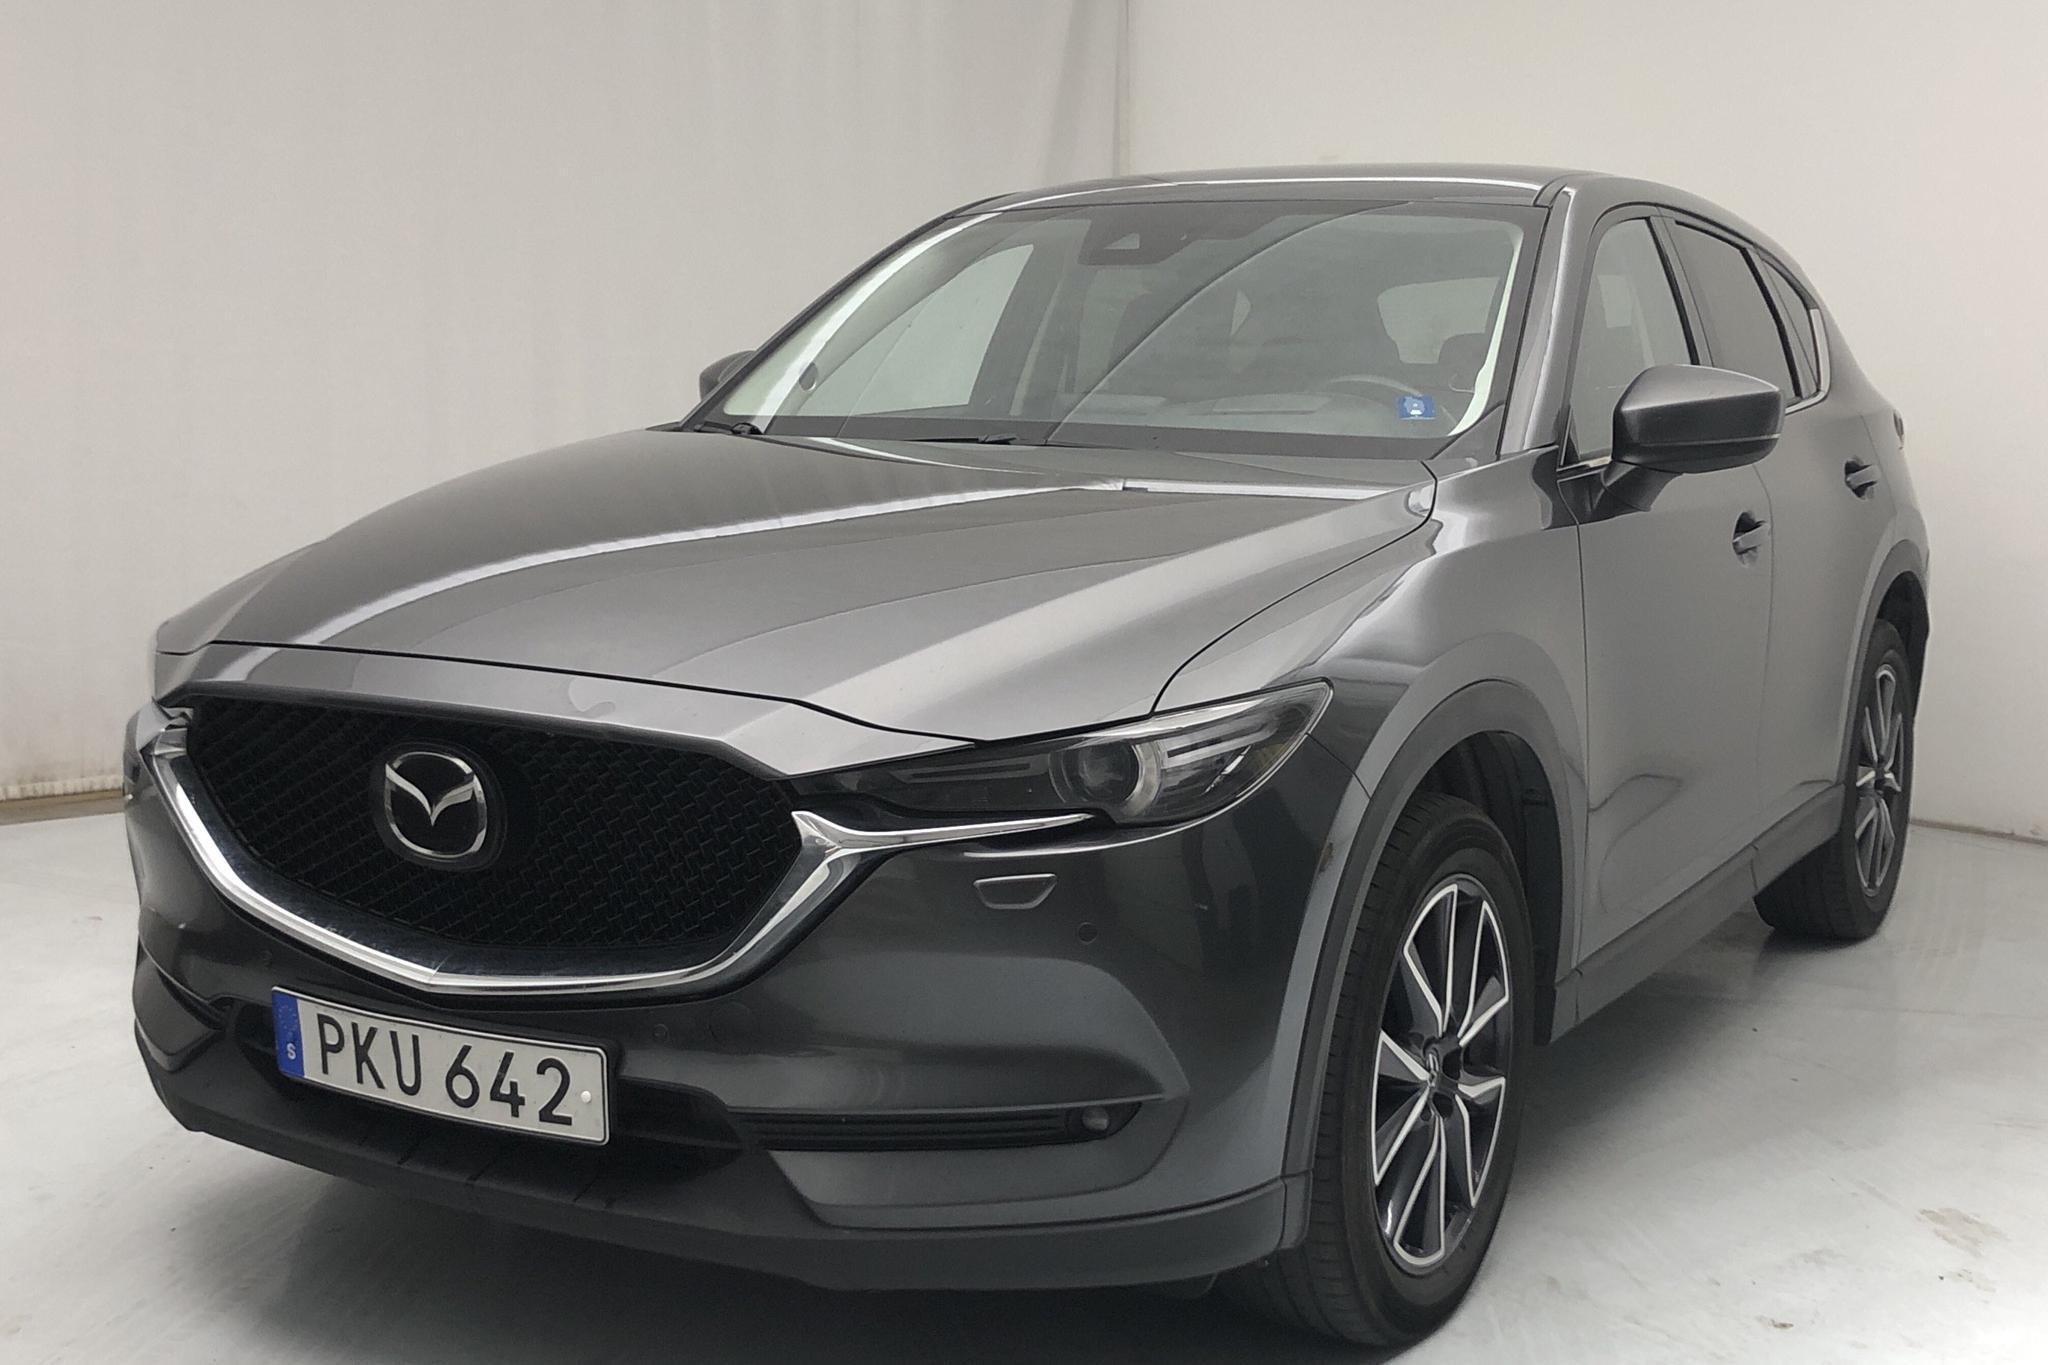 Mazda CX-5 2.2 DE AWD (175hk)